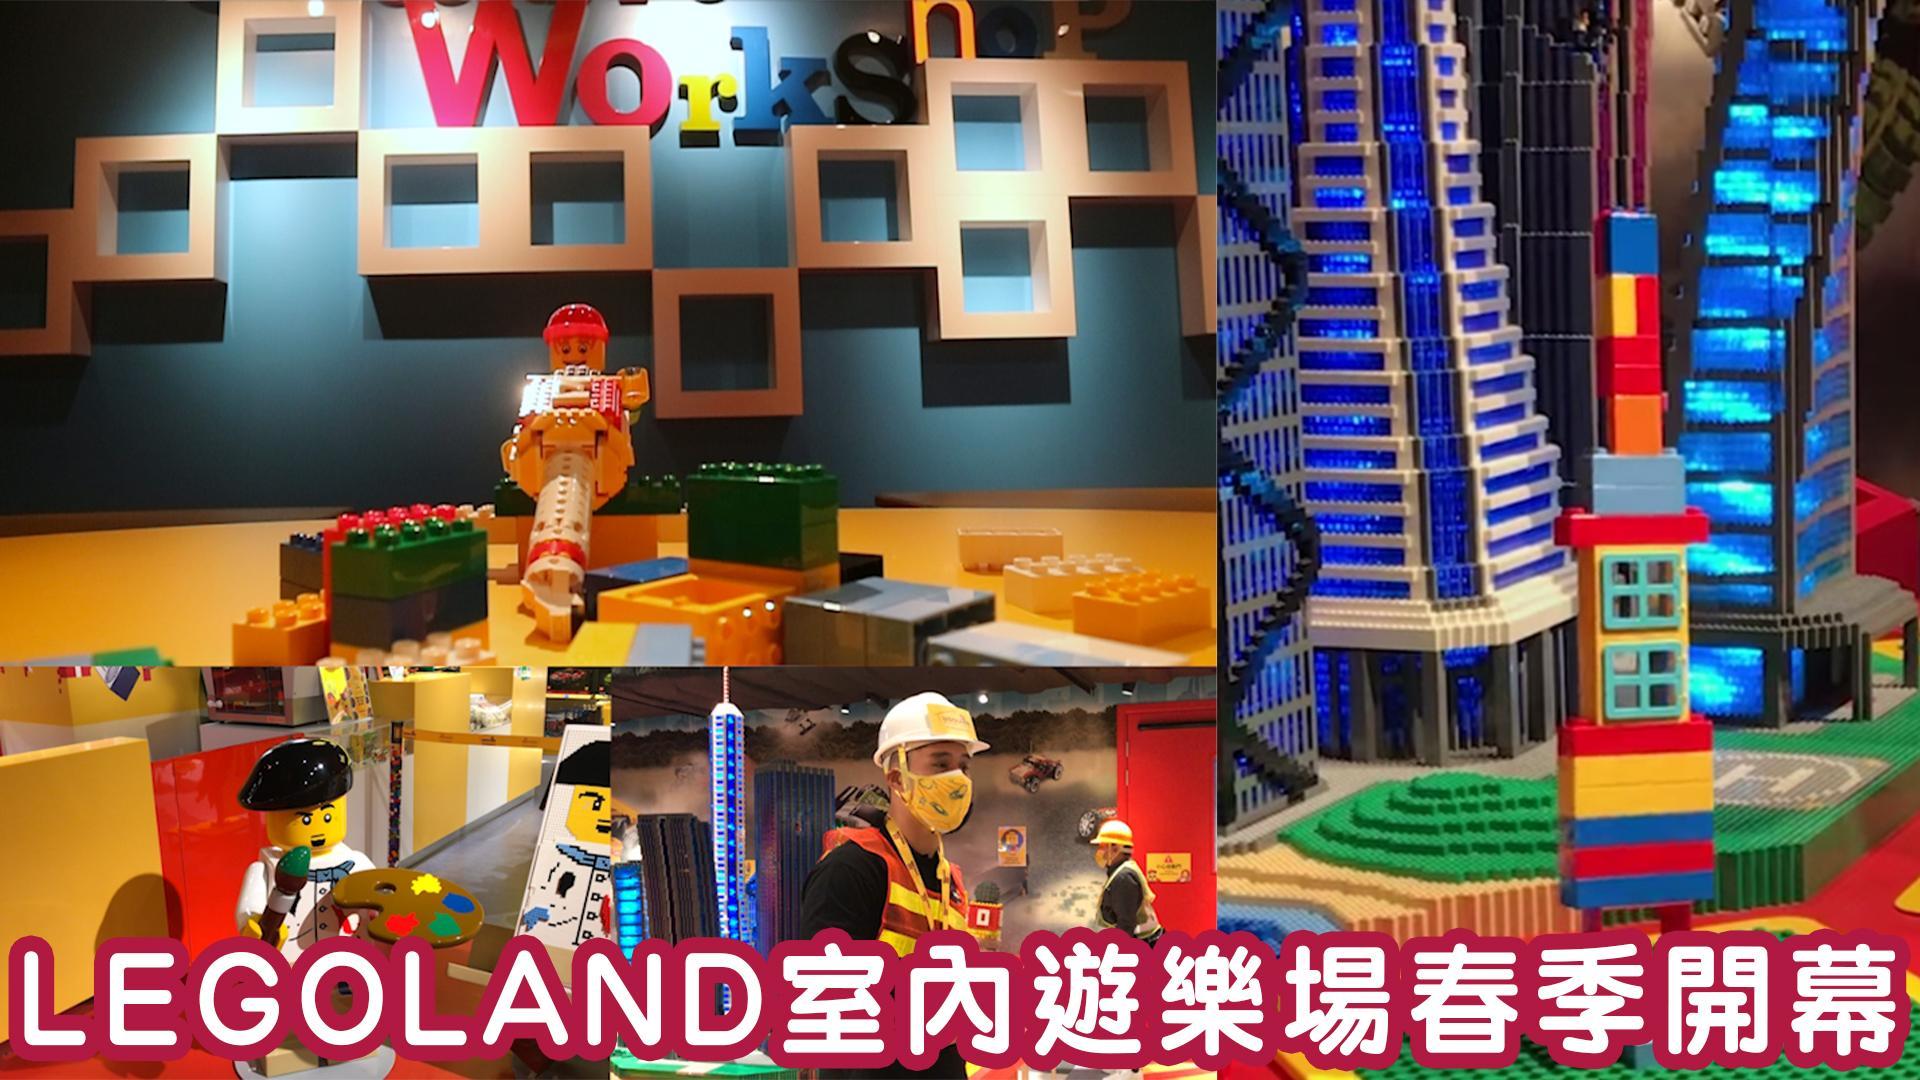 LEGOLAND室內遊樂場春季開幕 3萬呎主題園區率先睇